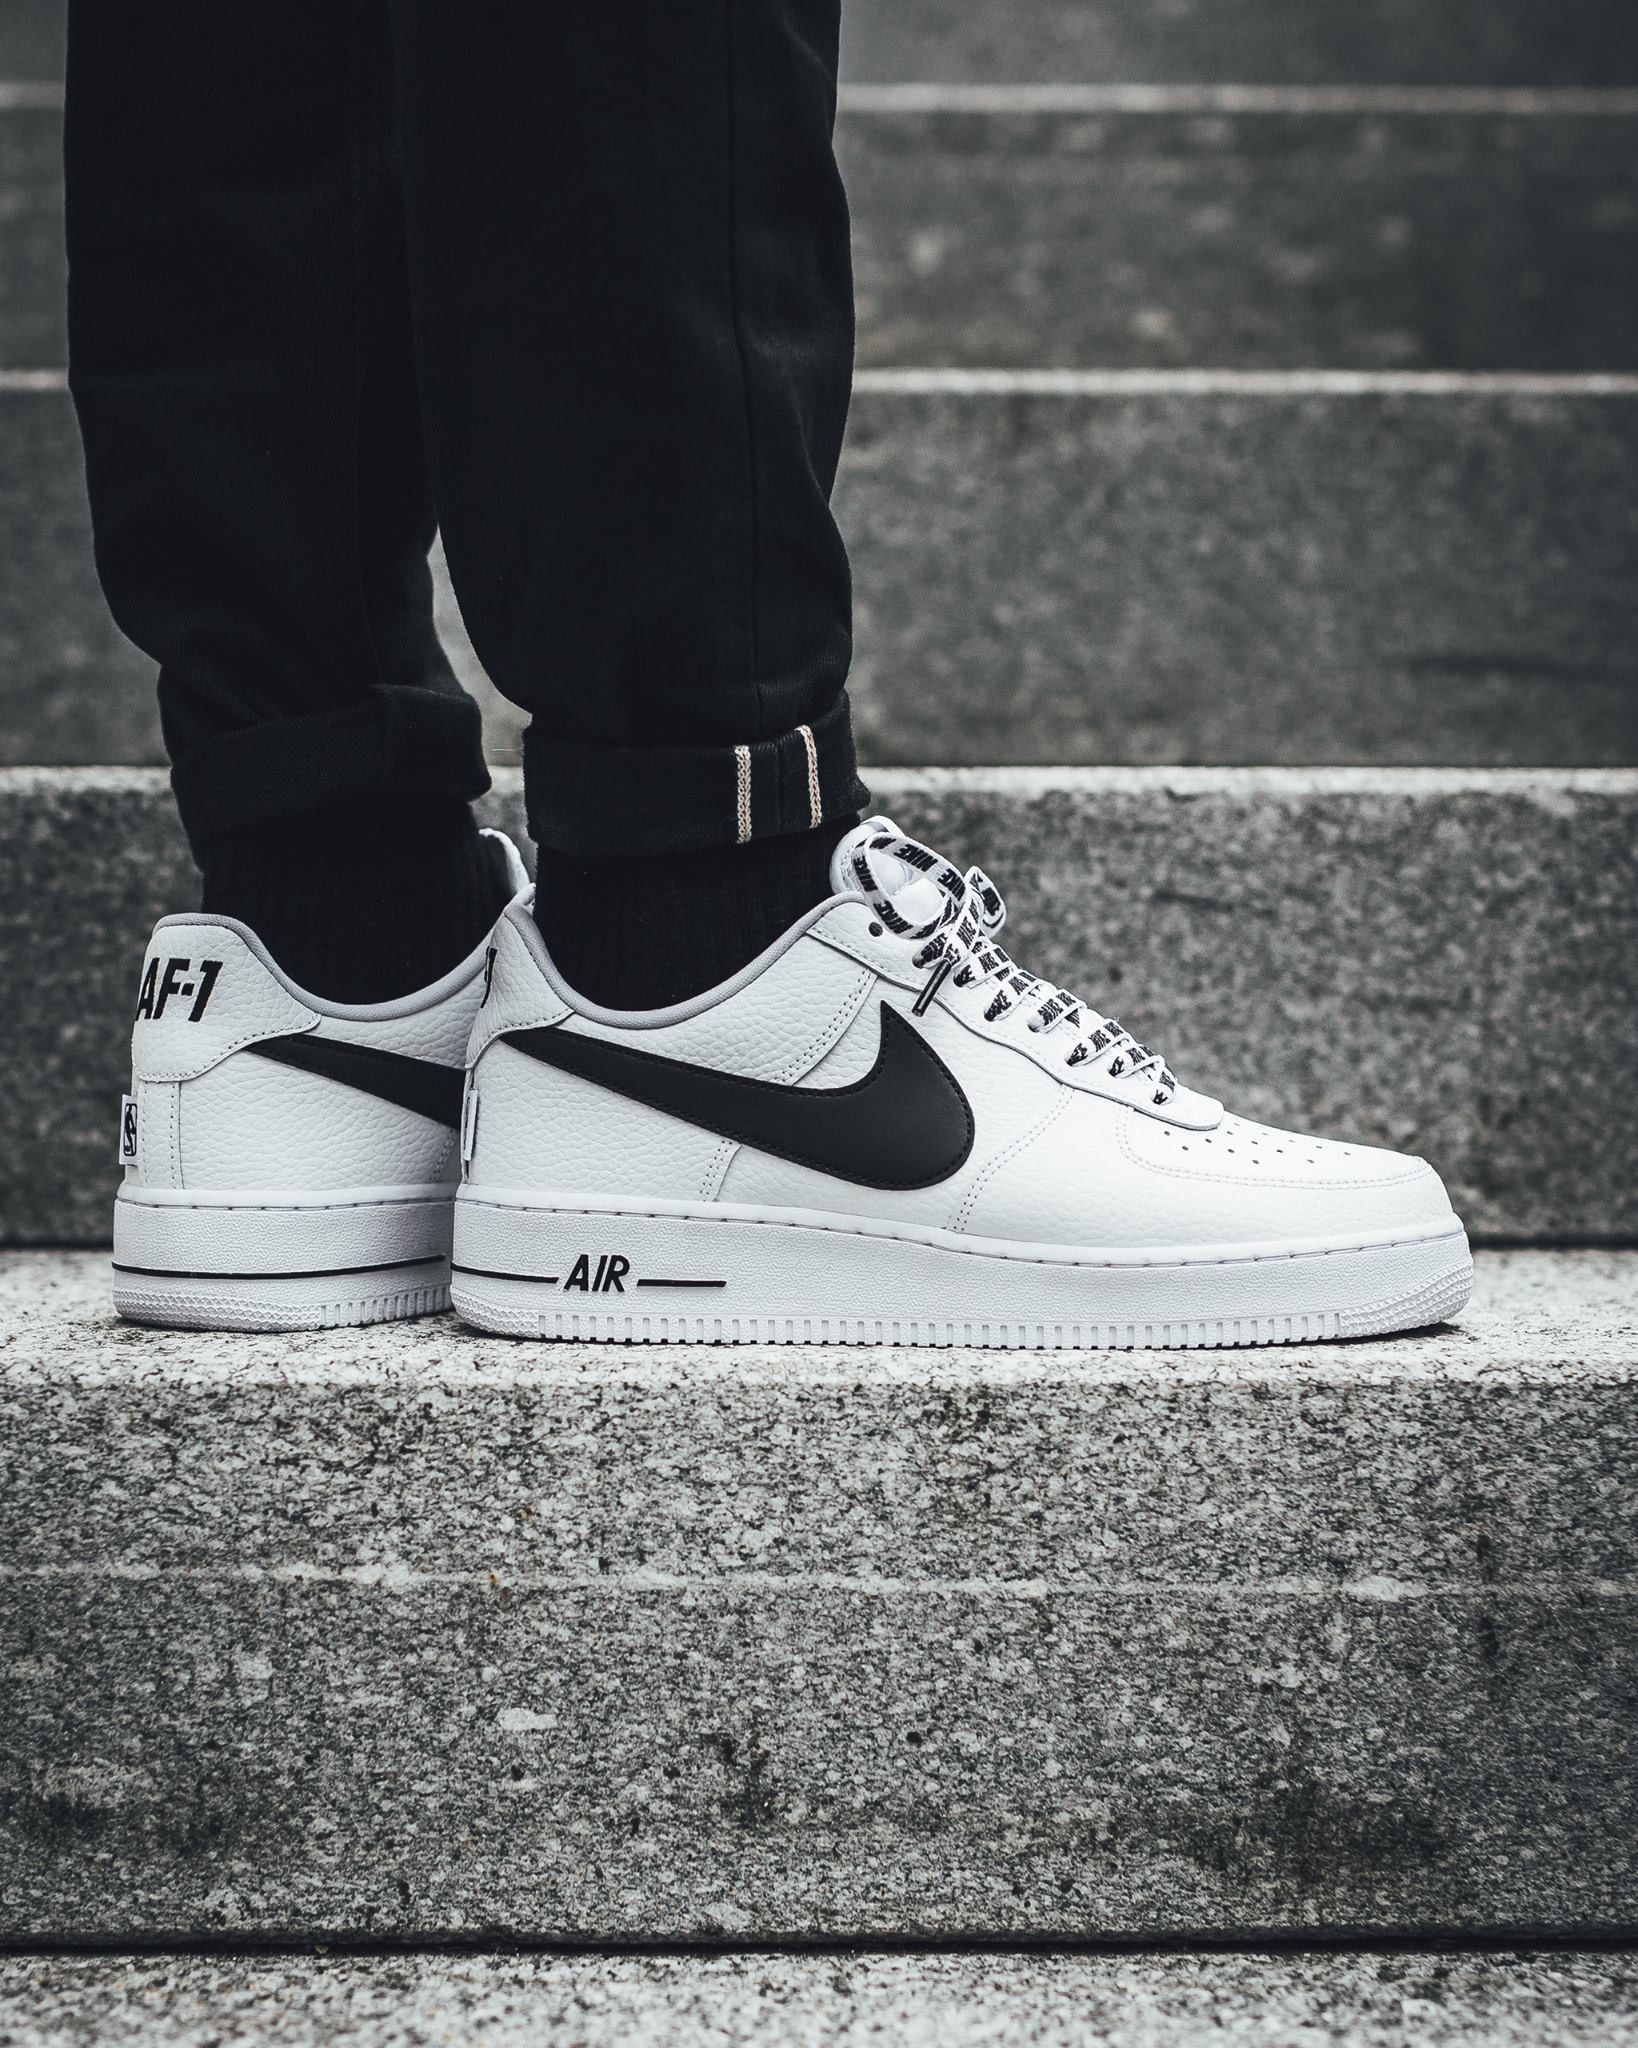 Nike Air Force 1 Nba Sapatos Tenis